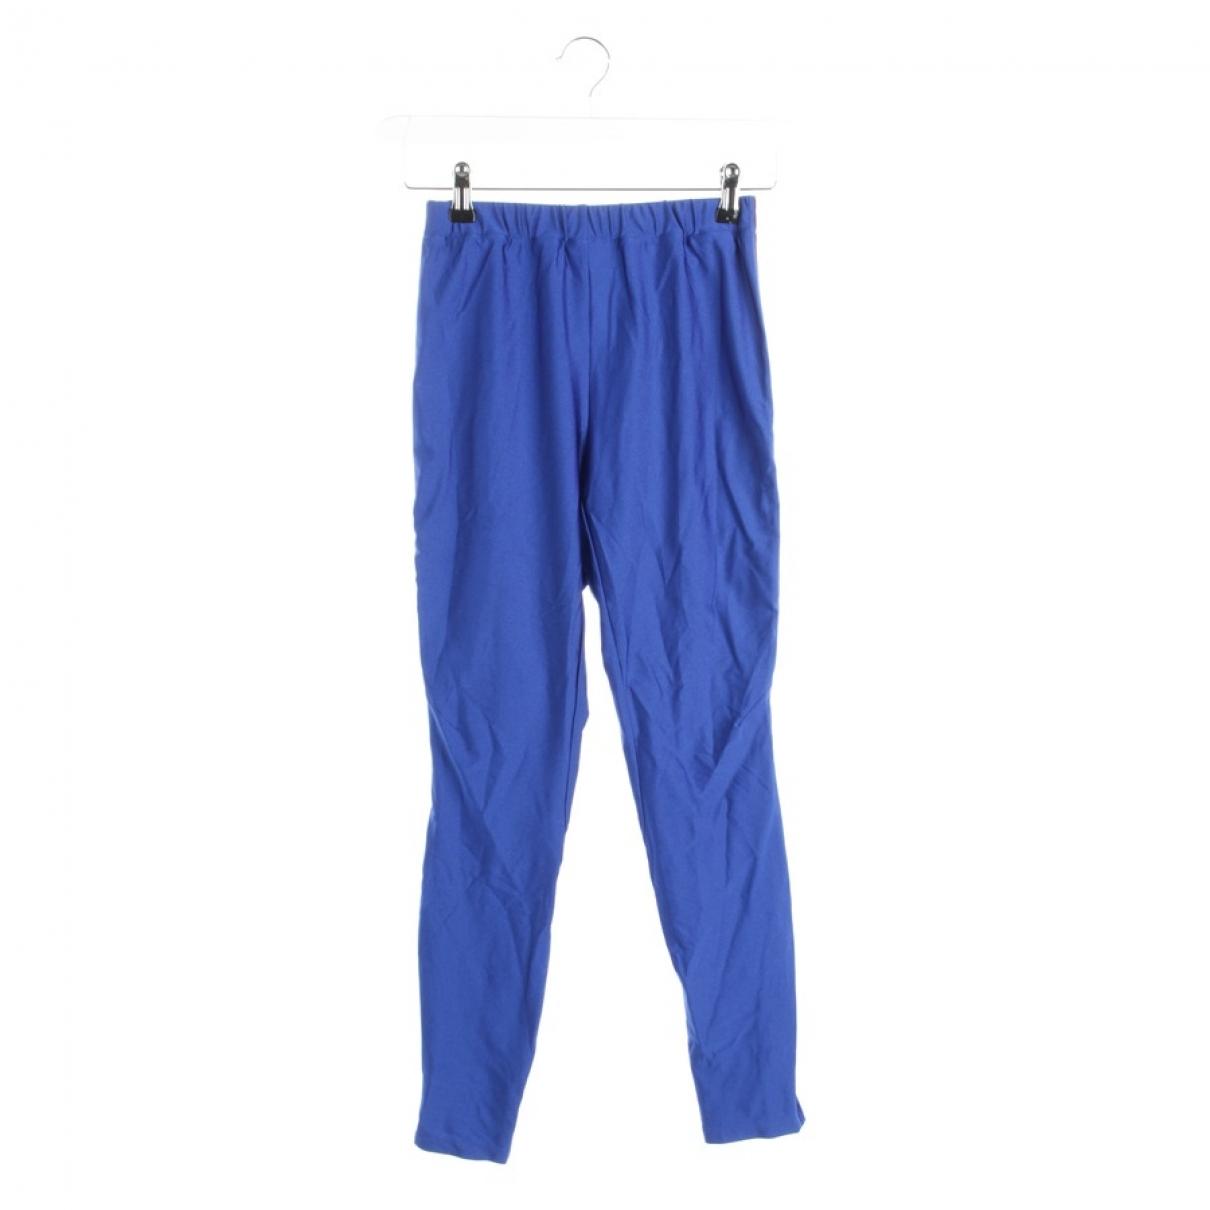 Gucci \N Blue Trousers for Women M International